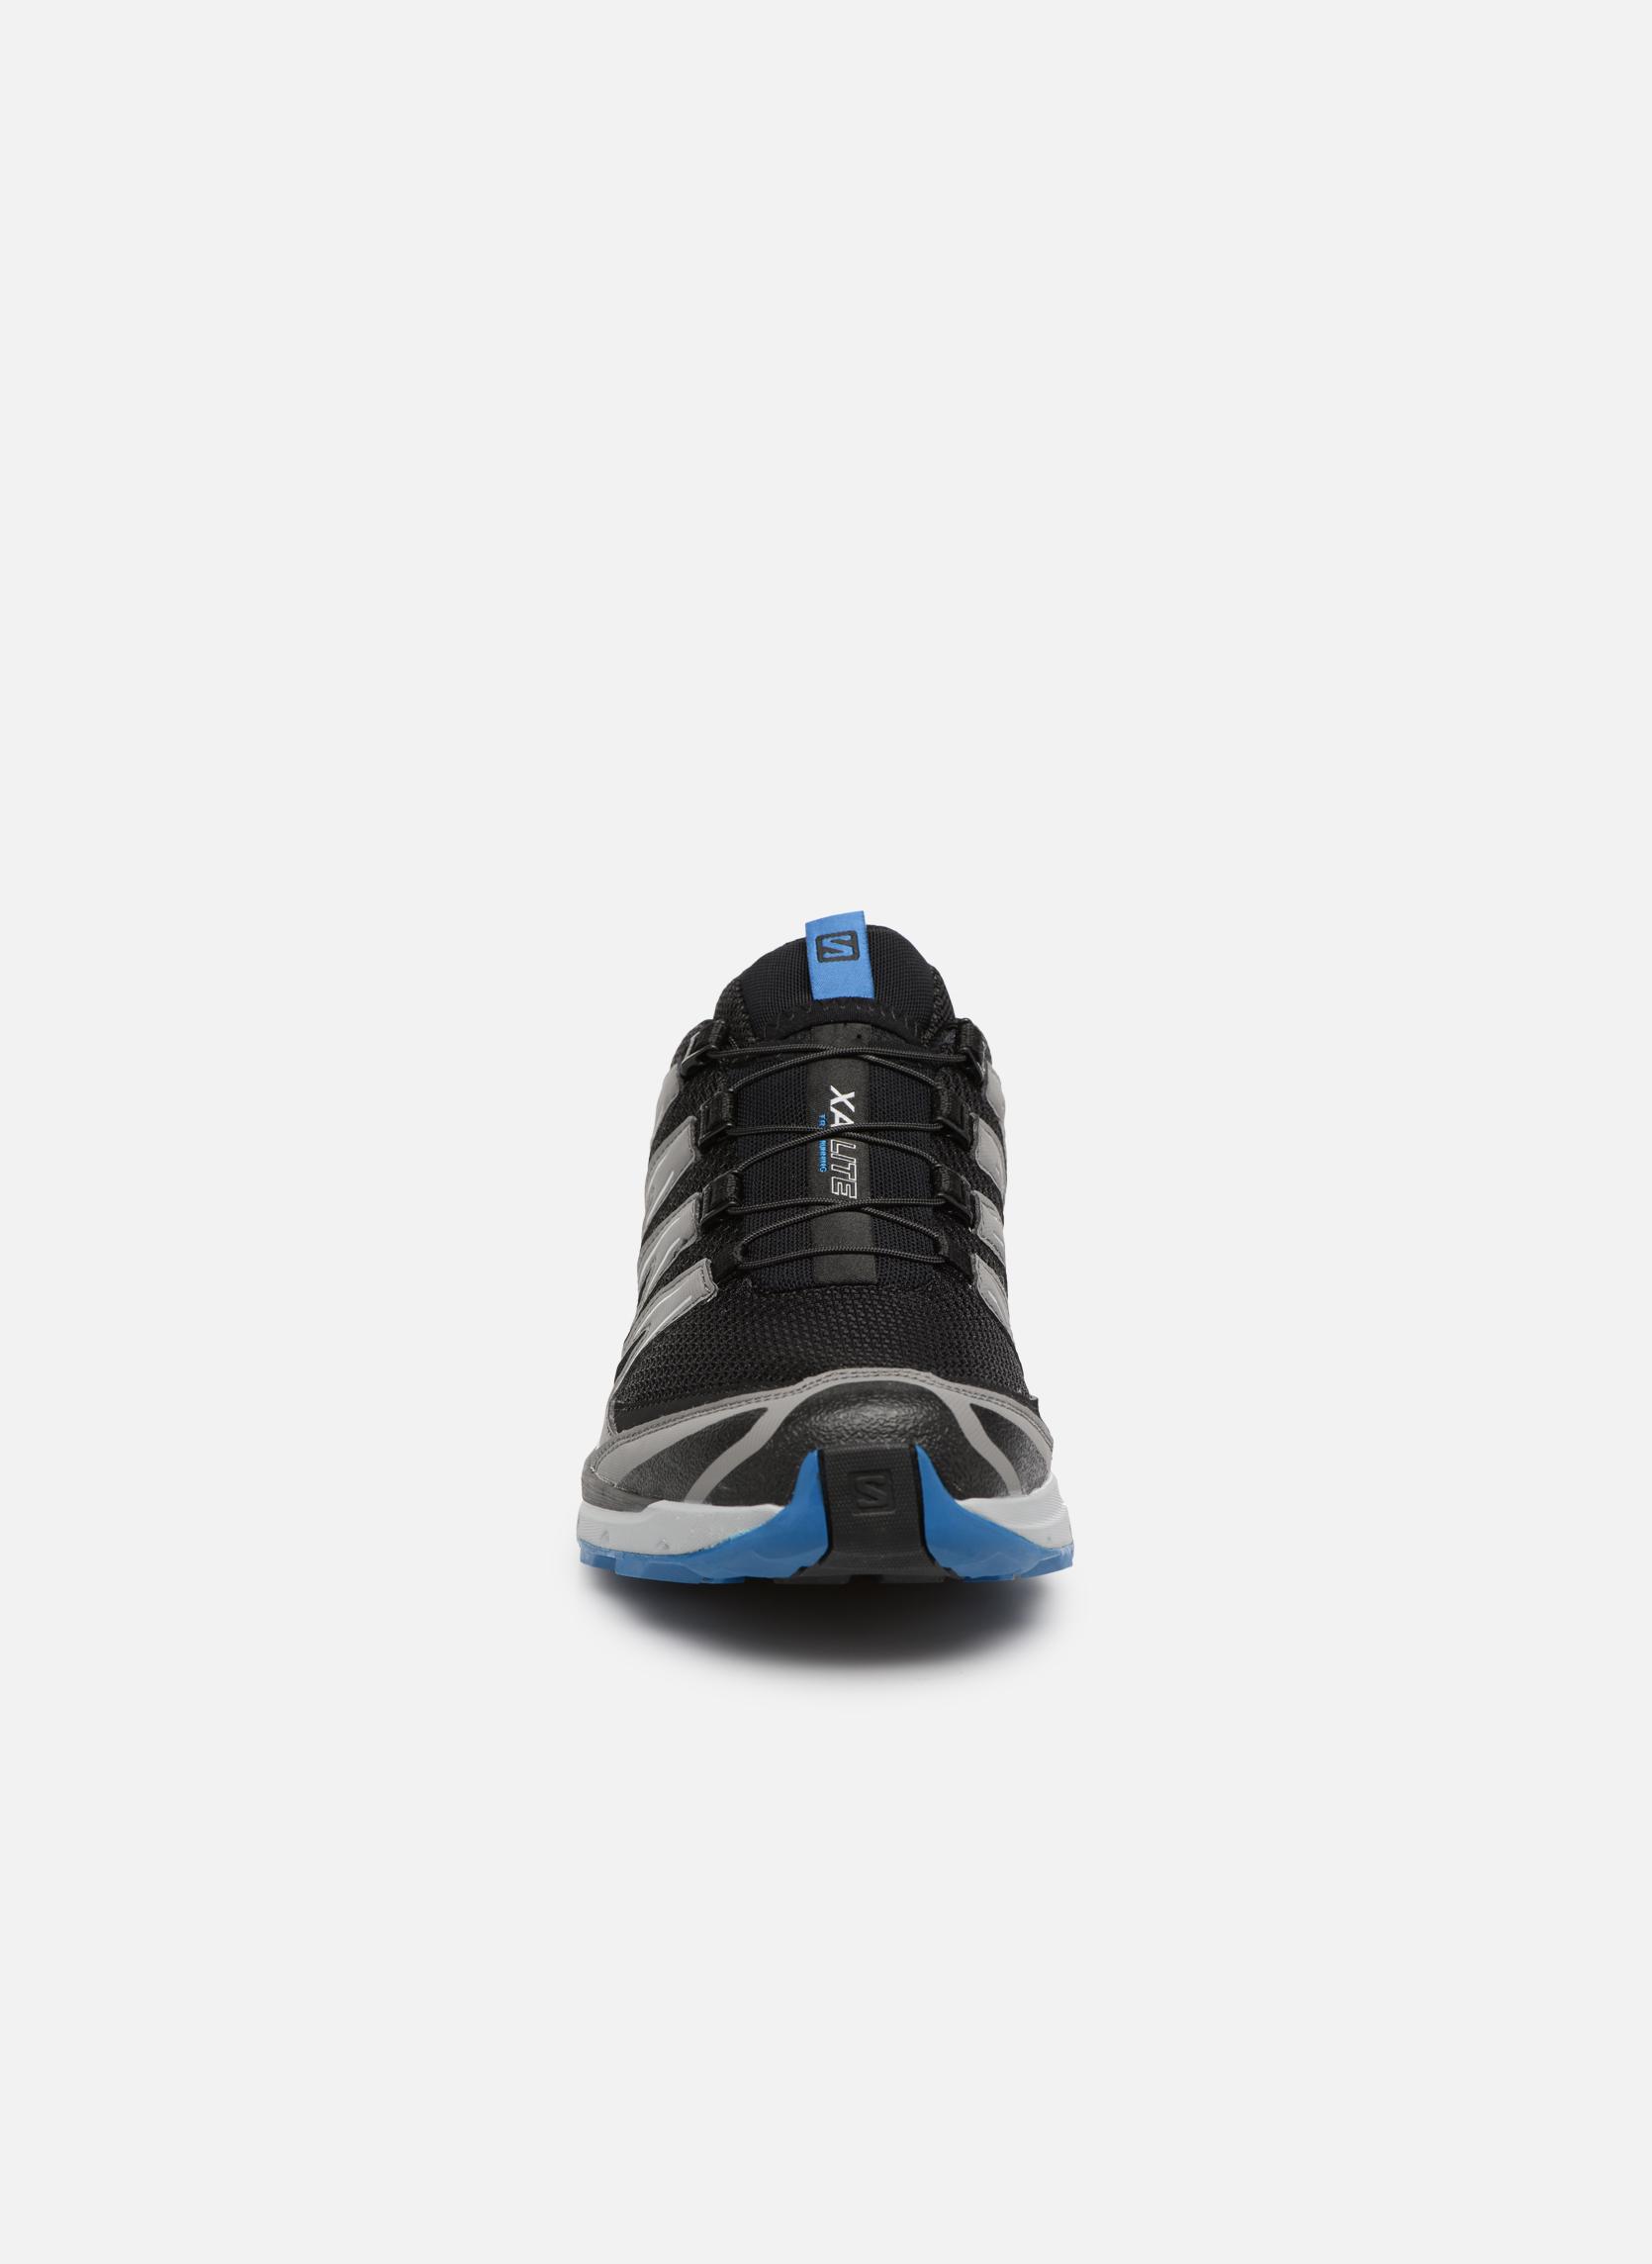 Xa Lite Black/Quiet Shade/Imperial Blue